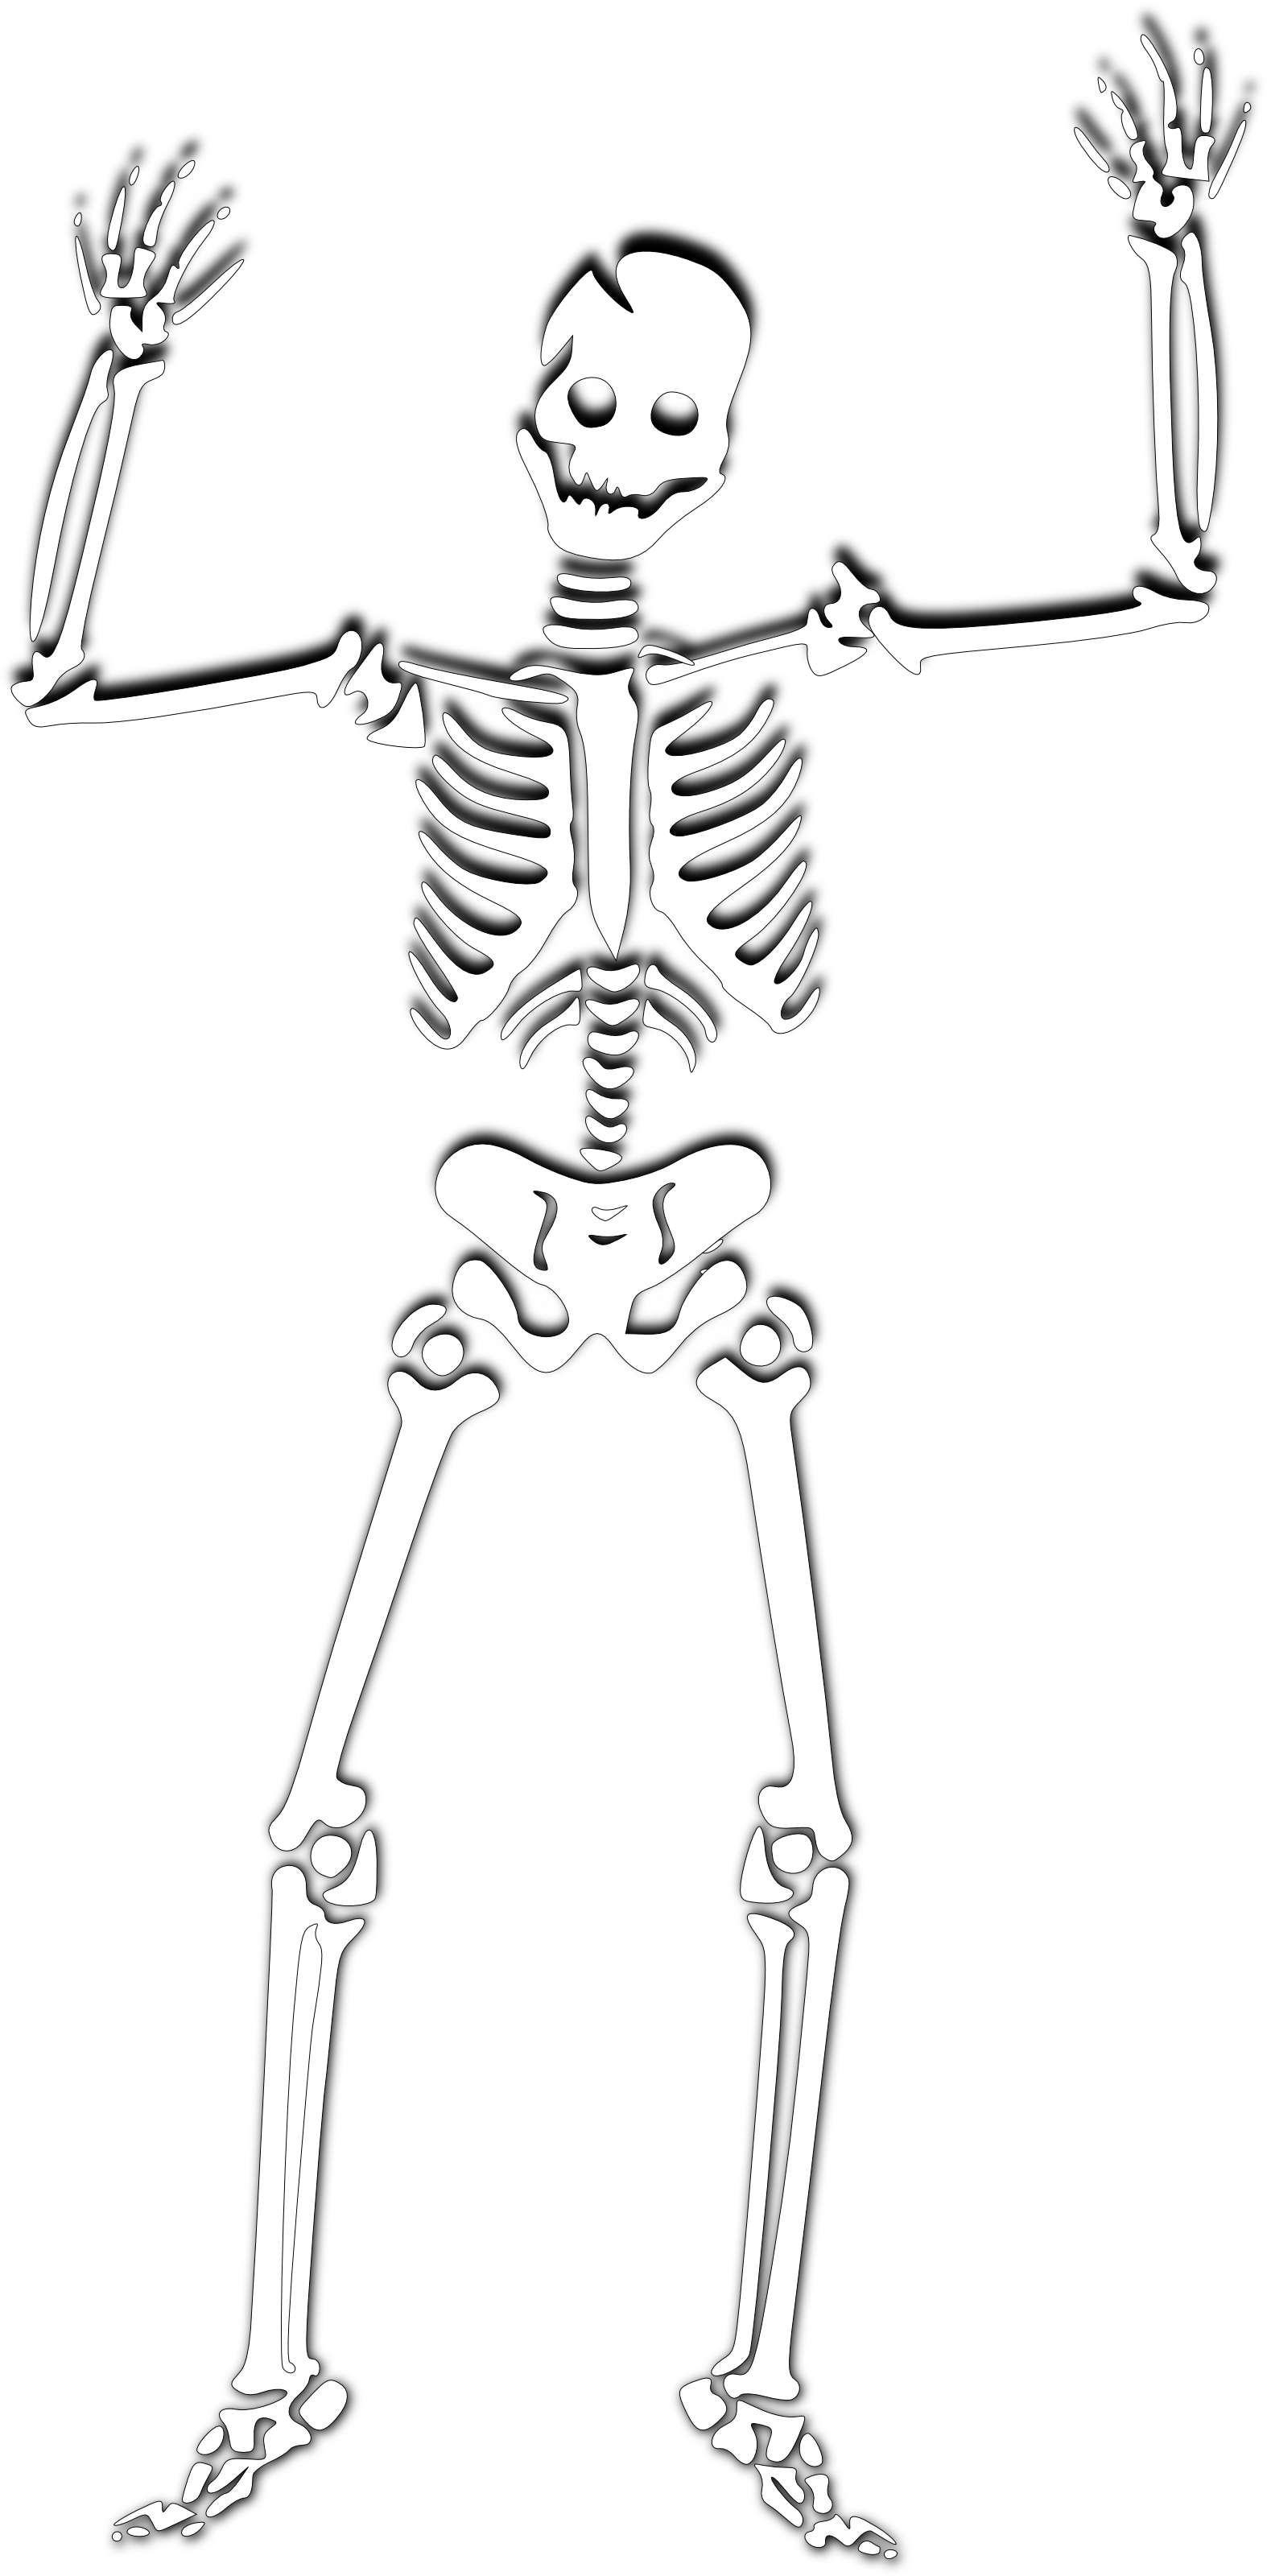 Free Skeleton Clip Art Pictures.